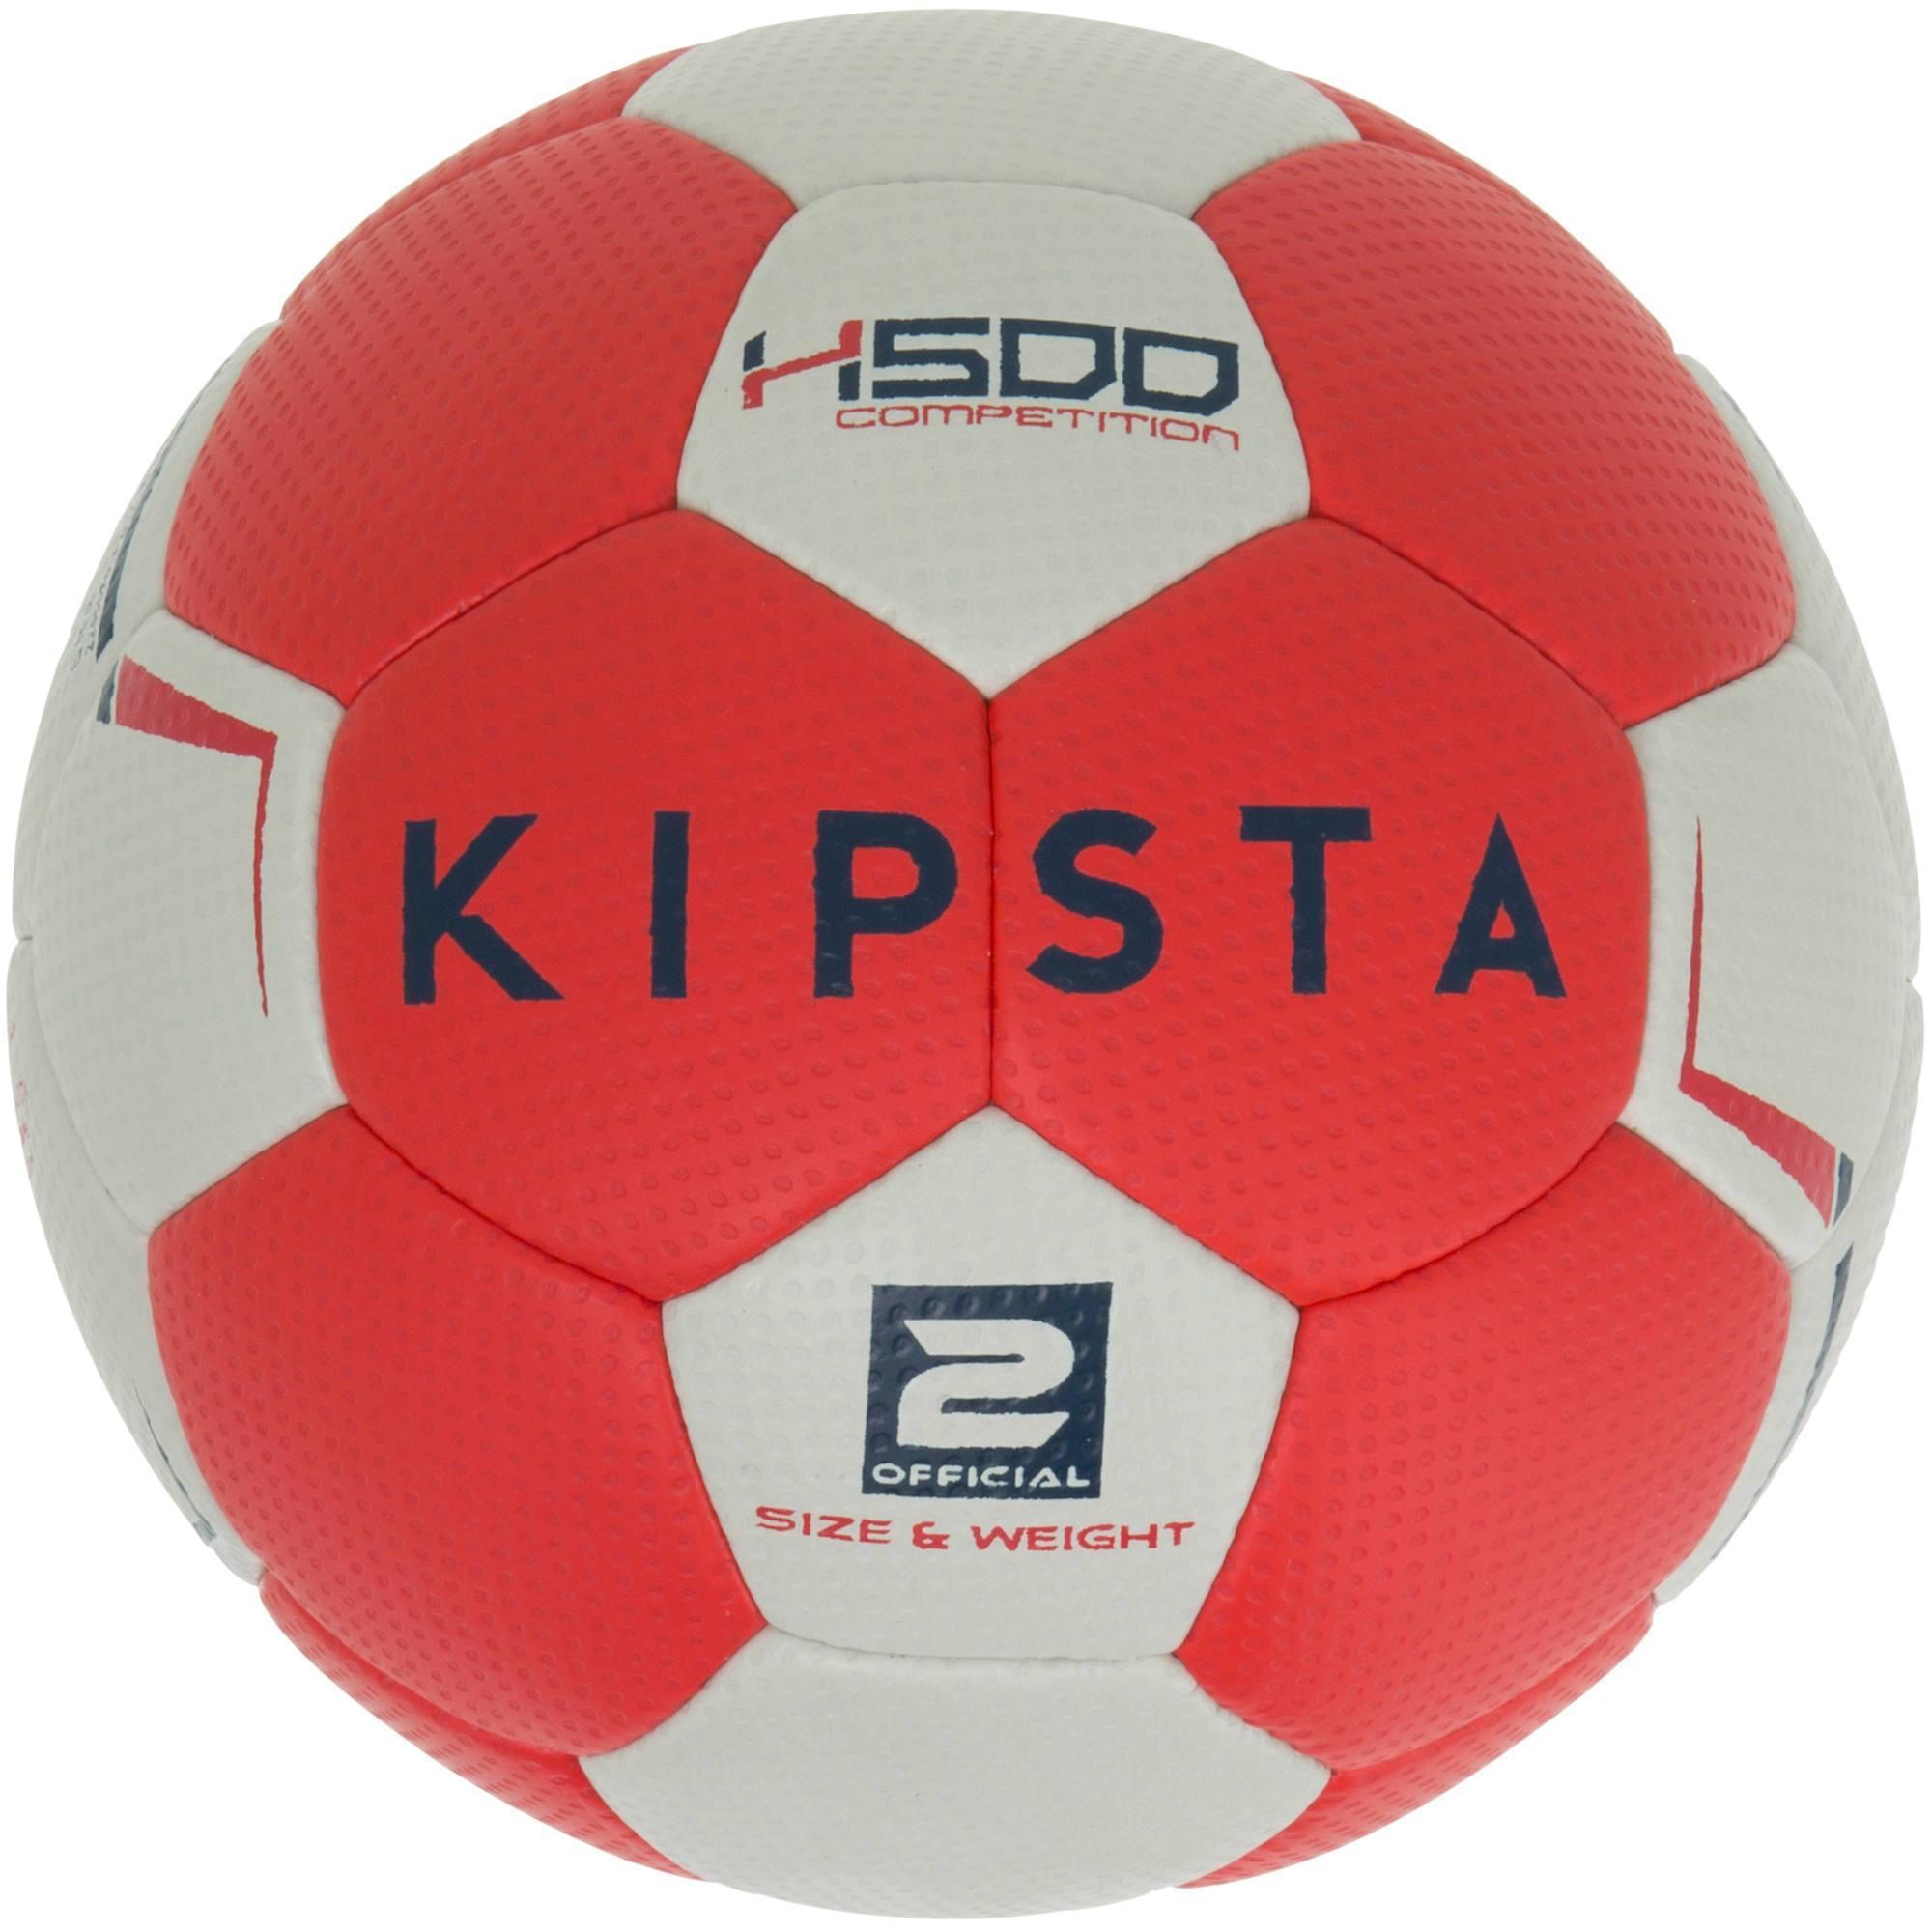 ballon de handball hybride h500 taille 2 rouge et gris. Black Bedroom Furniture Sets. Home Design Ideas